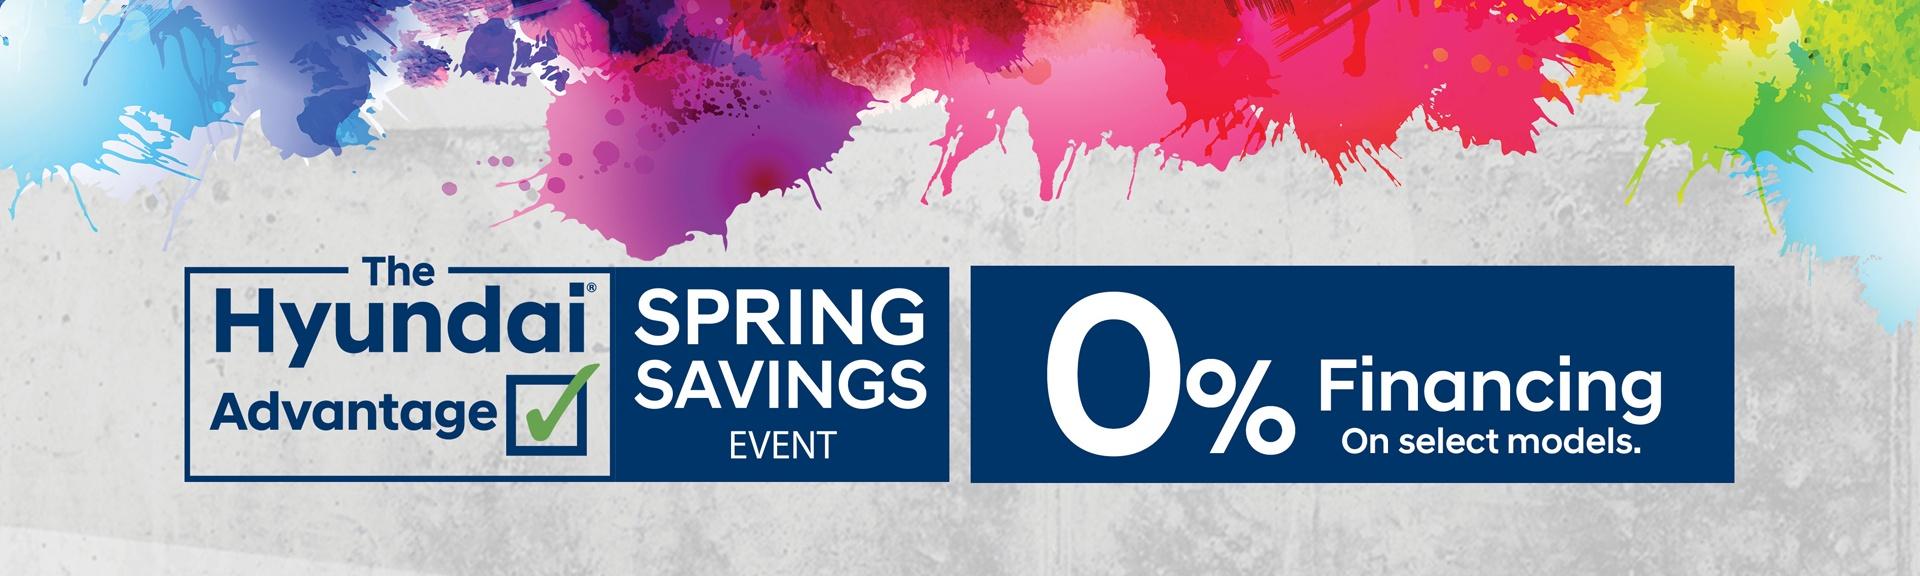 Spring Saving Event